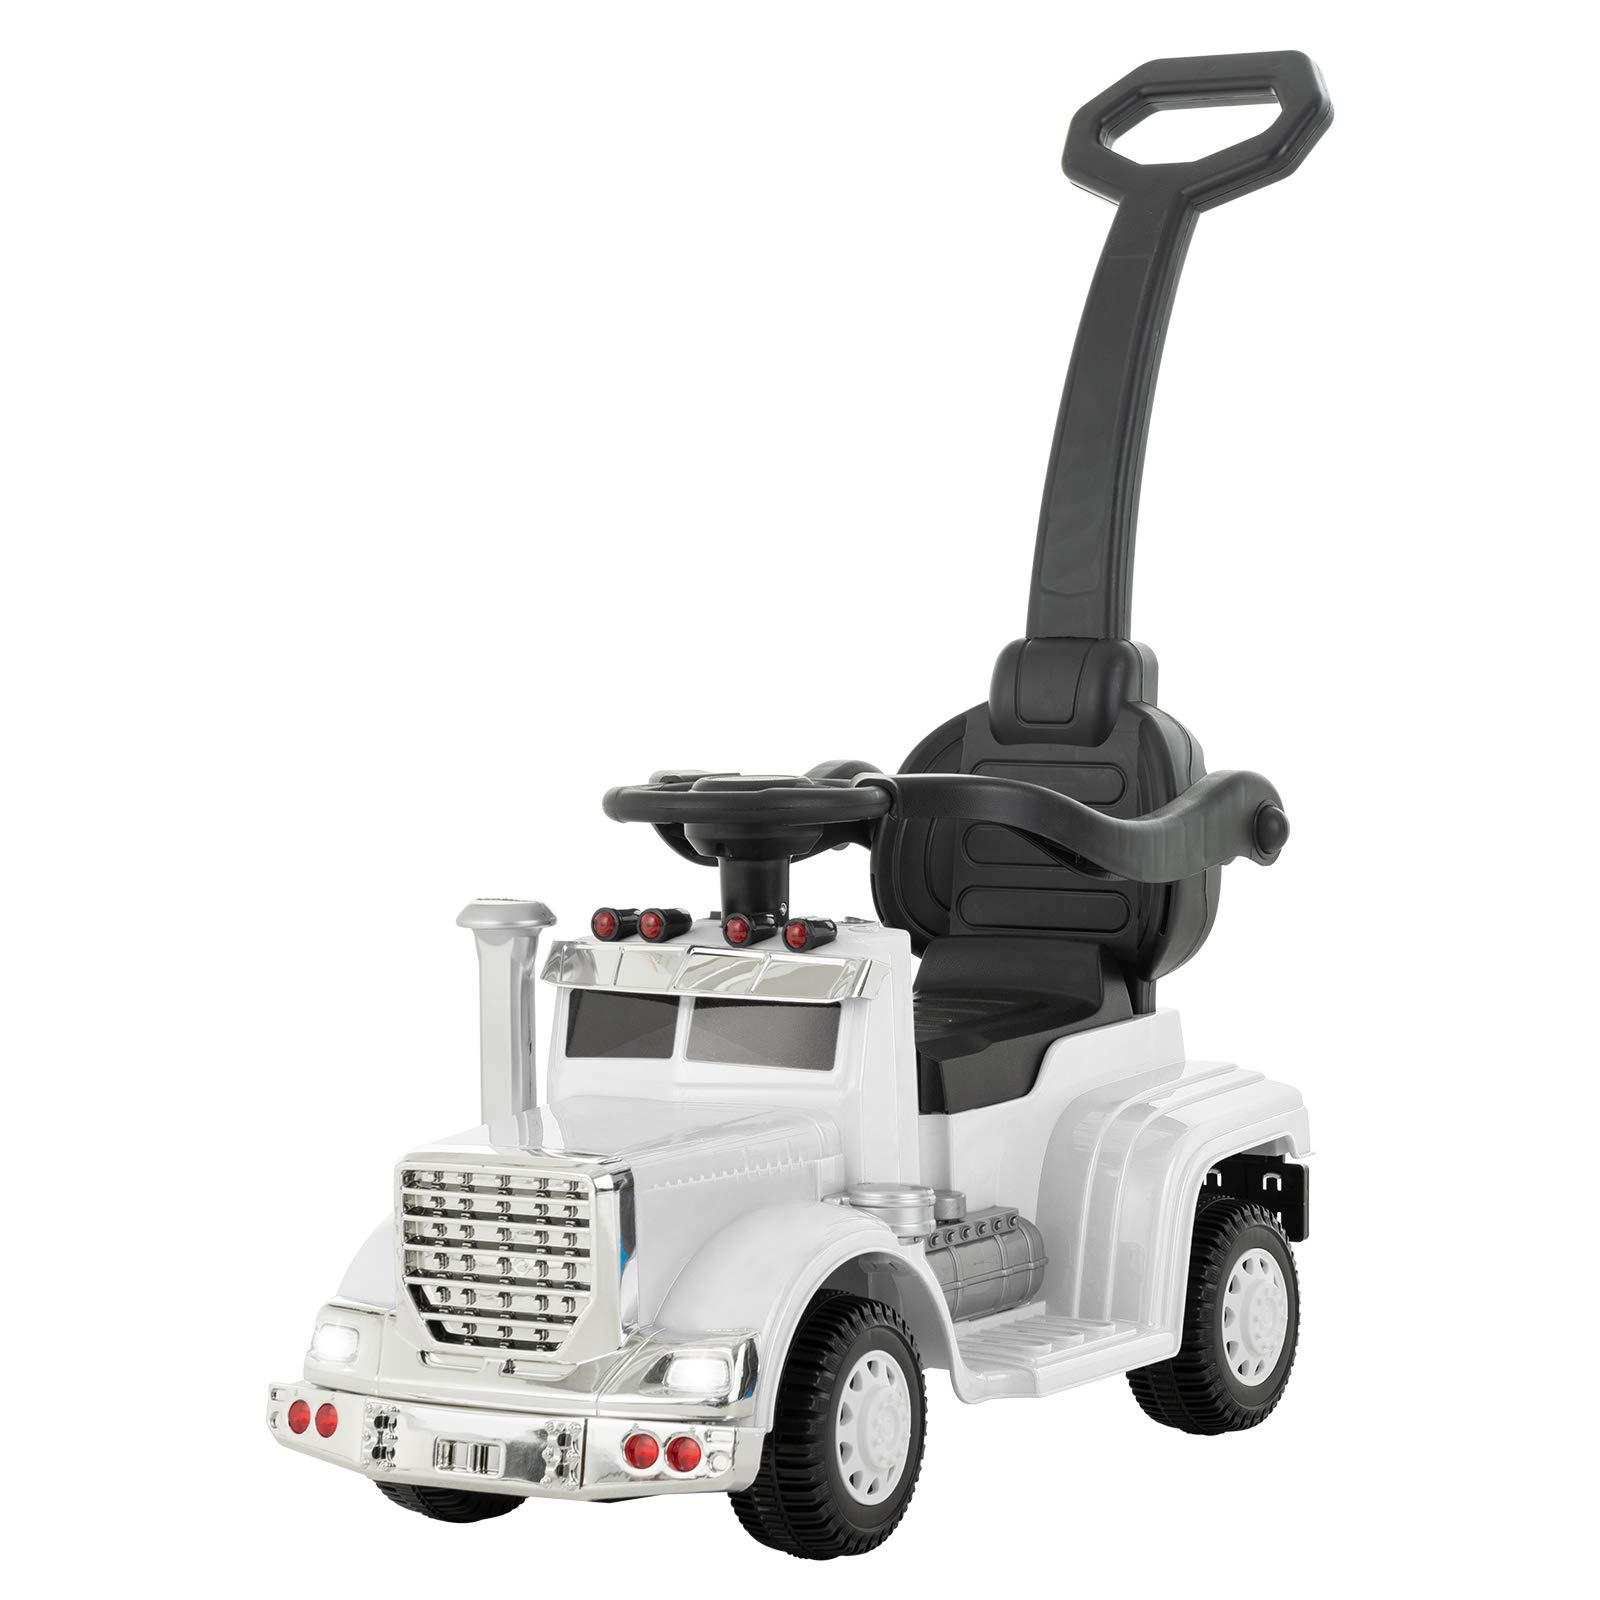 Uenjoy 6V Push Ride on Car 3 in 1 Convertible Baby Toddler Stroller, Battery Powered Kids Electric Vehicles, Parental Handle, Armrest Guardrails, LED Lights, Music, Horn, White